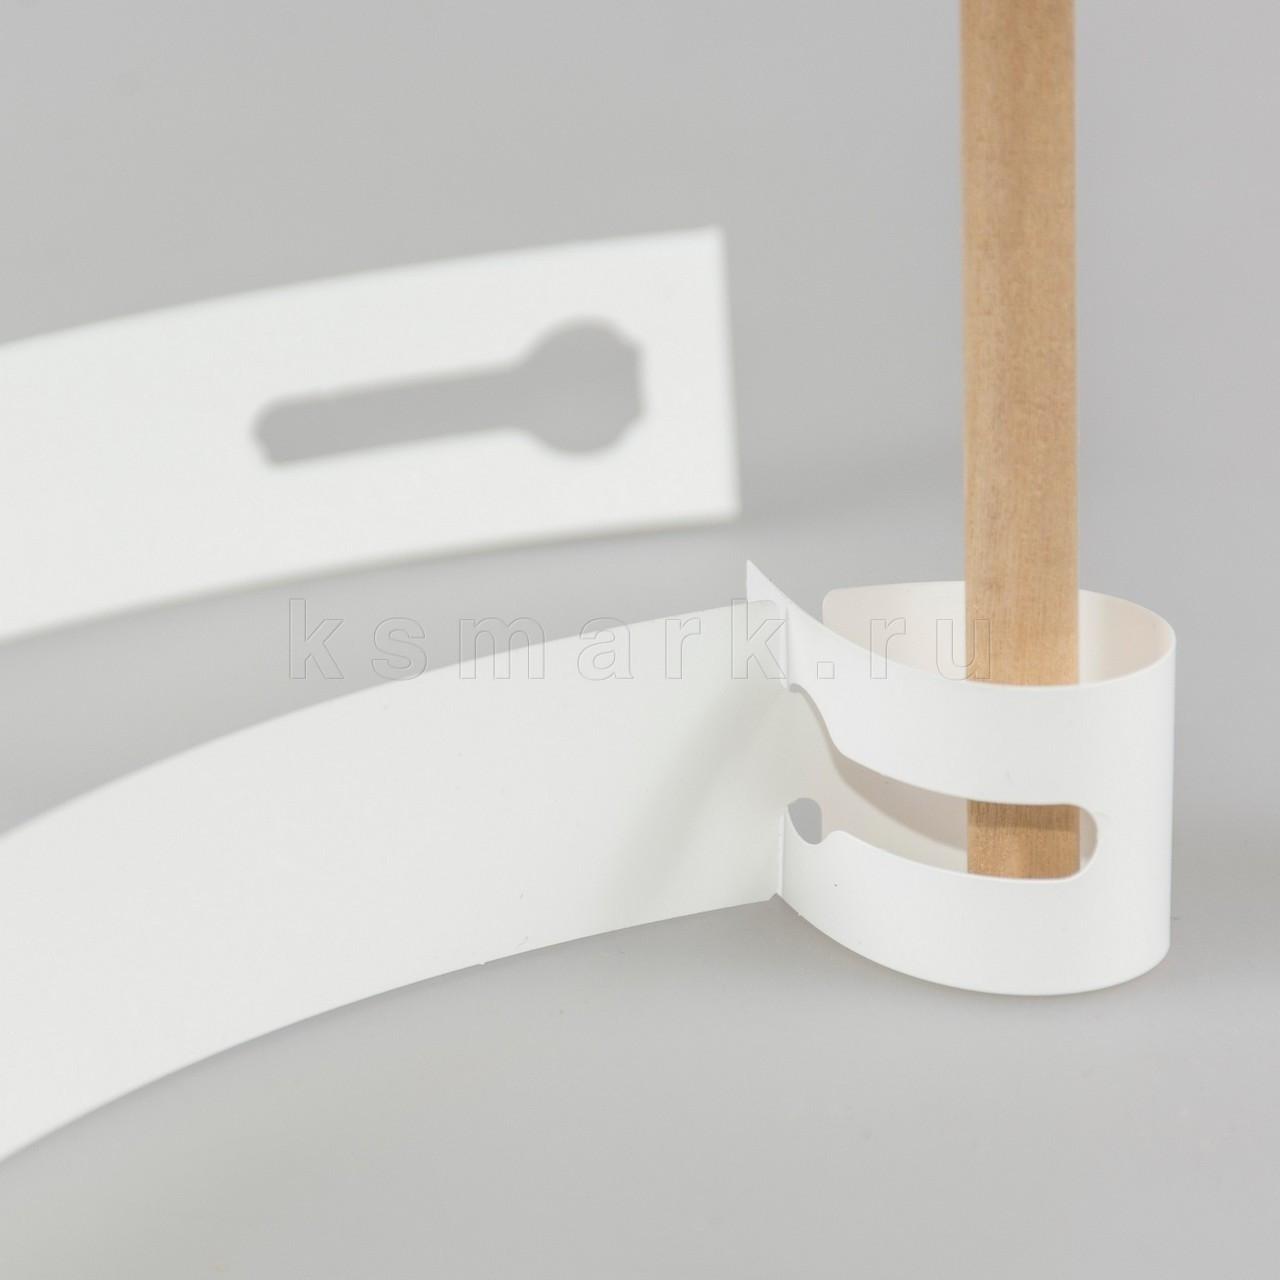 Бирка-петелька для маркировки растений 20х165 мм  5000 шт